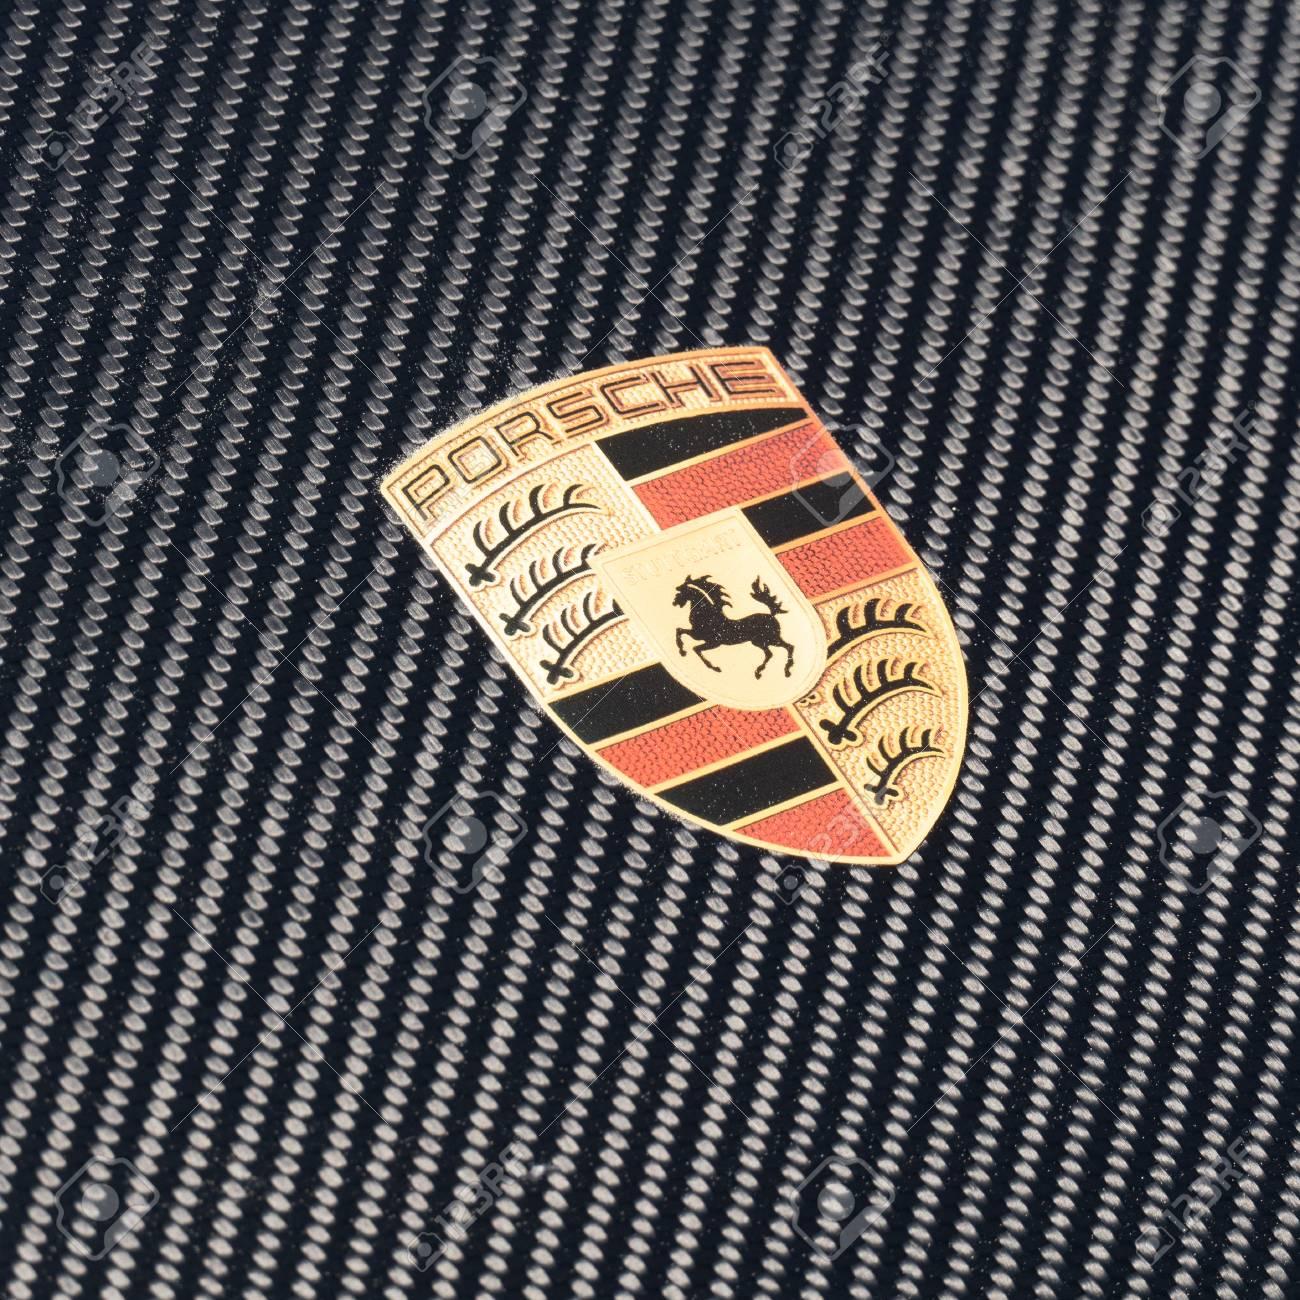 Porsche logo on carbon cars hood. Close up view. SEP 26, 2018..